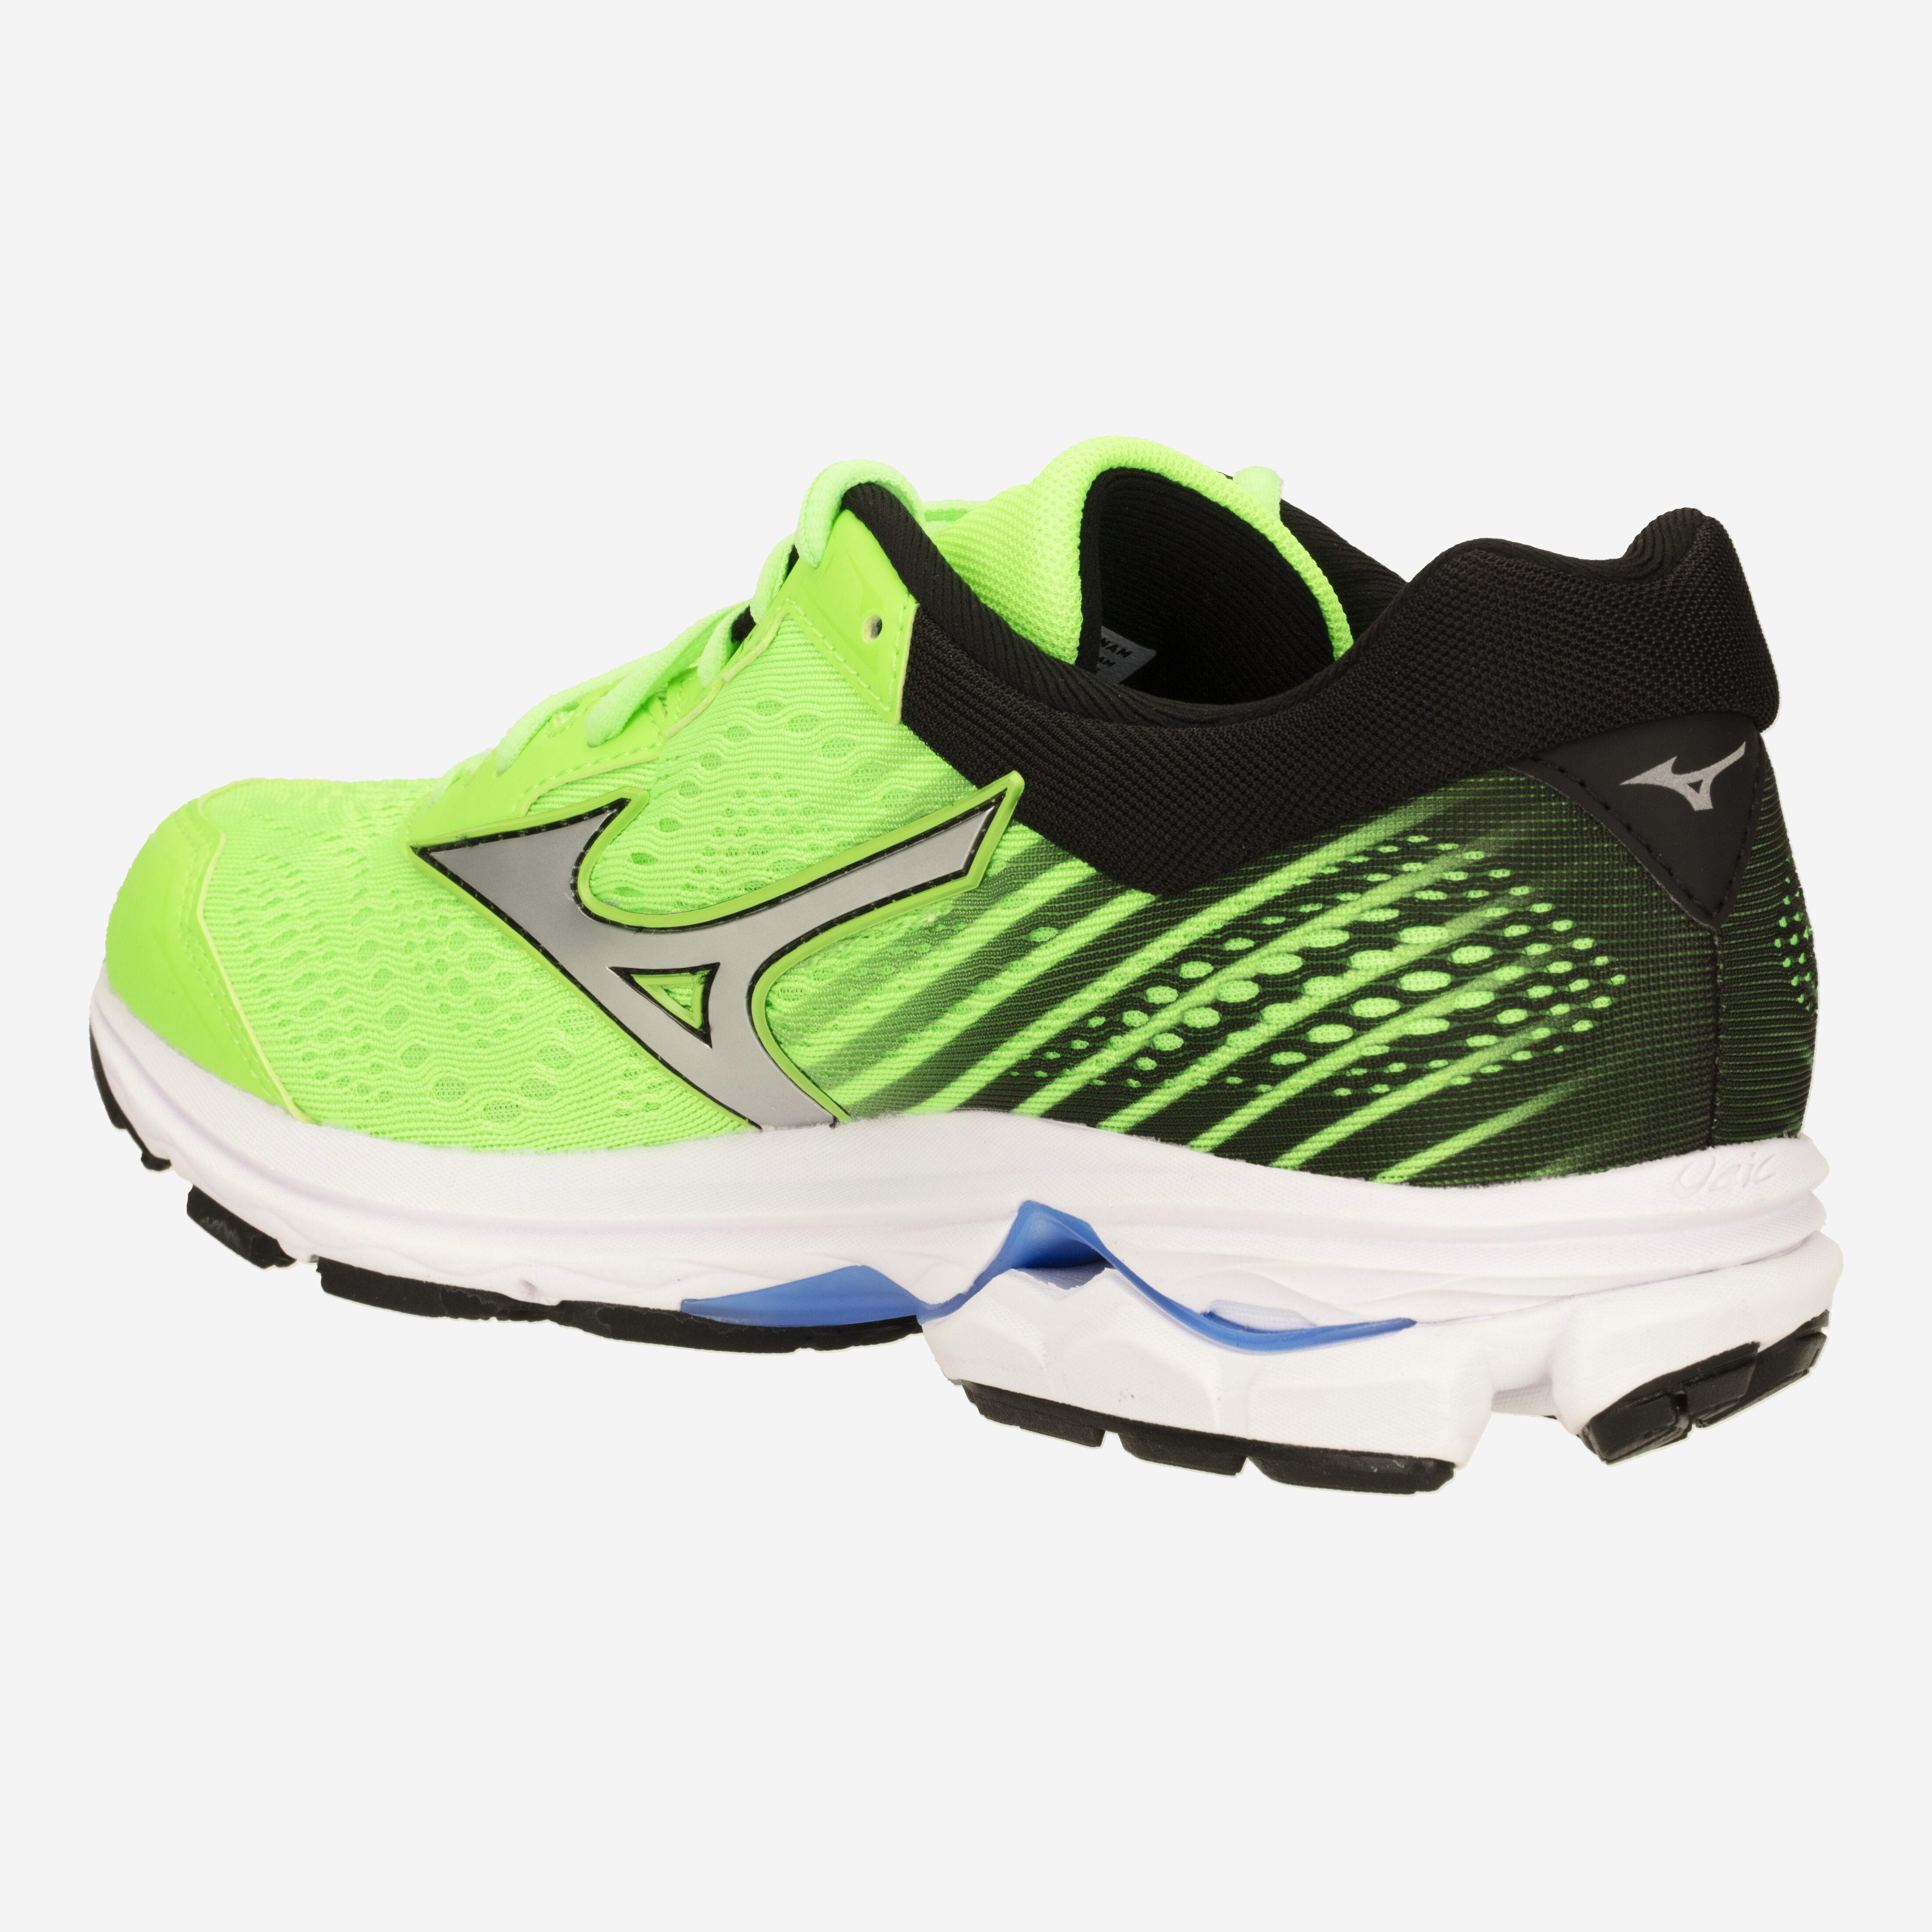 de9ed80e2 Mizuno Wave Rider 22 shoes 2019 RUNKD online running store